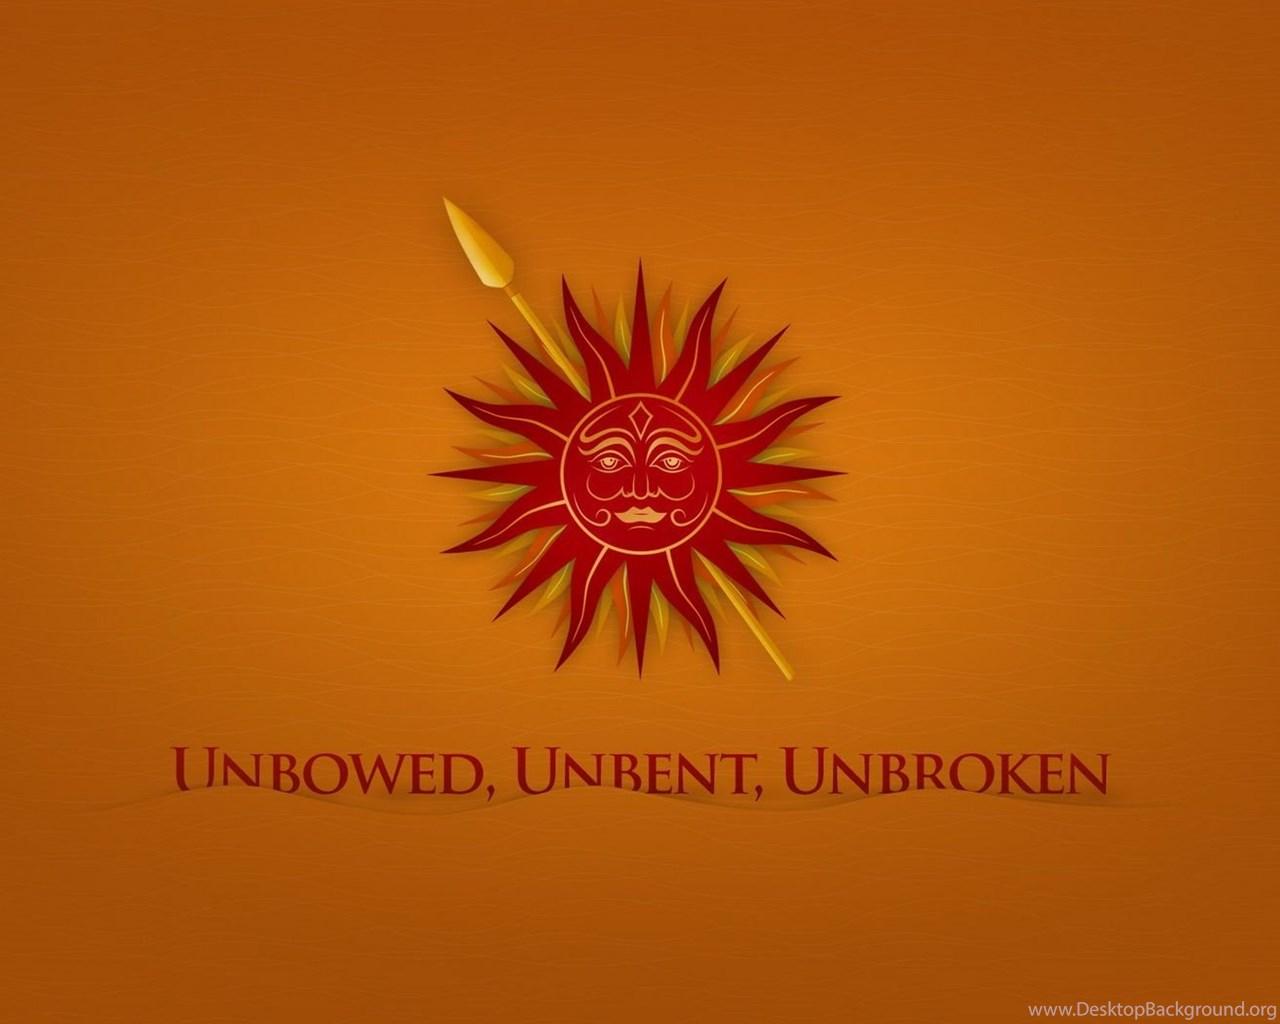 Widescreen Game Of Thrones Casa Martell 1846442 Hd